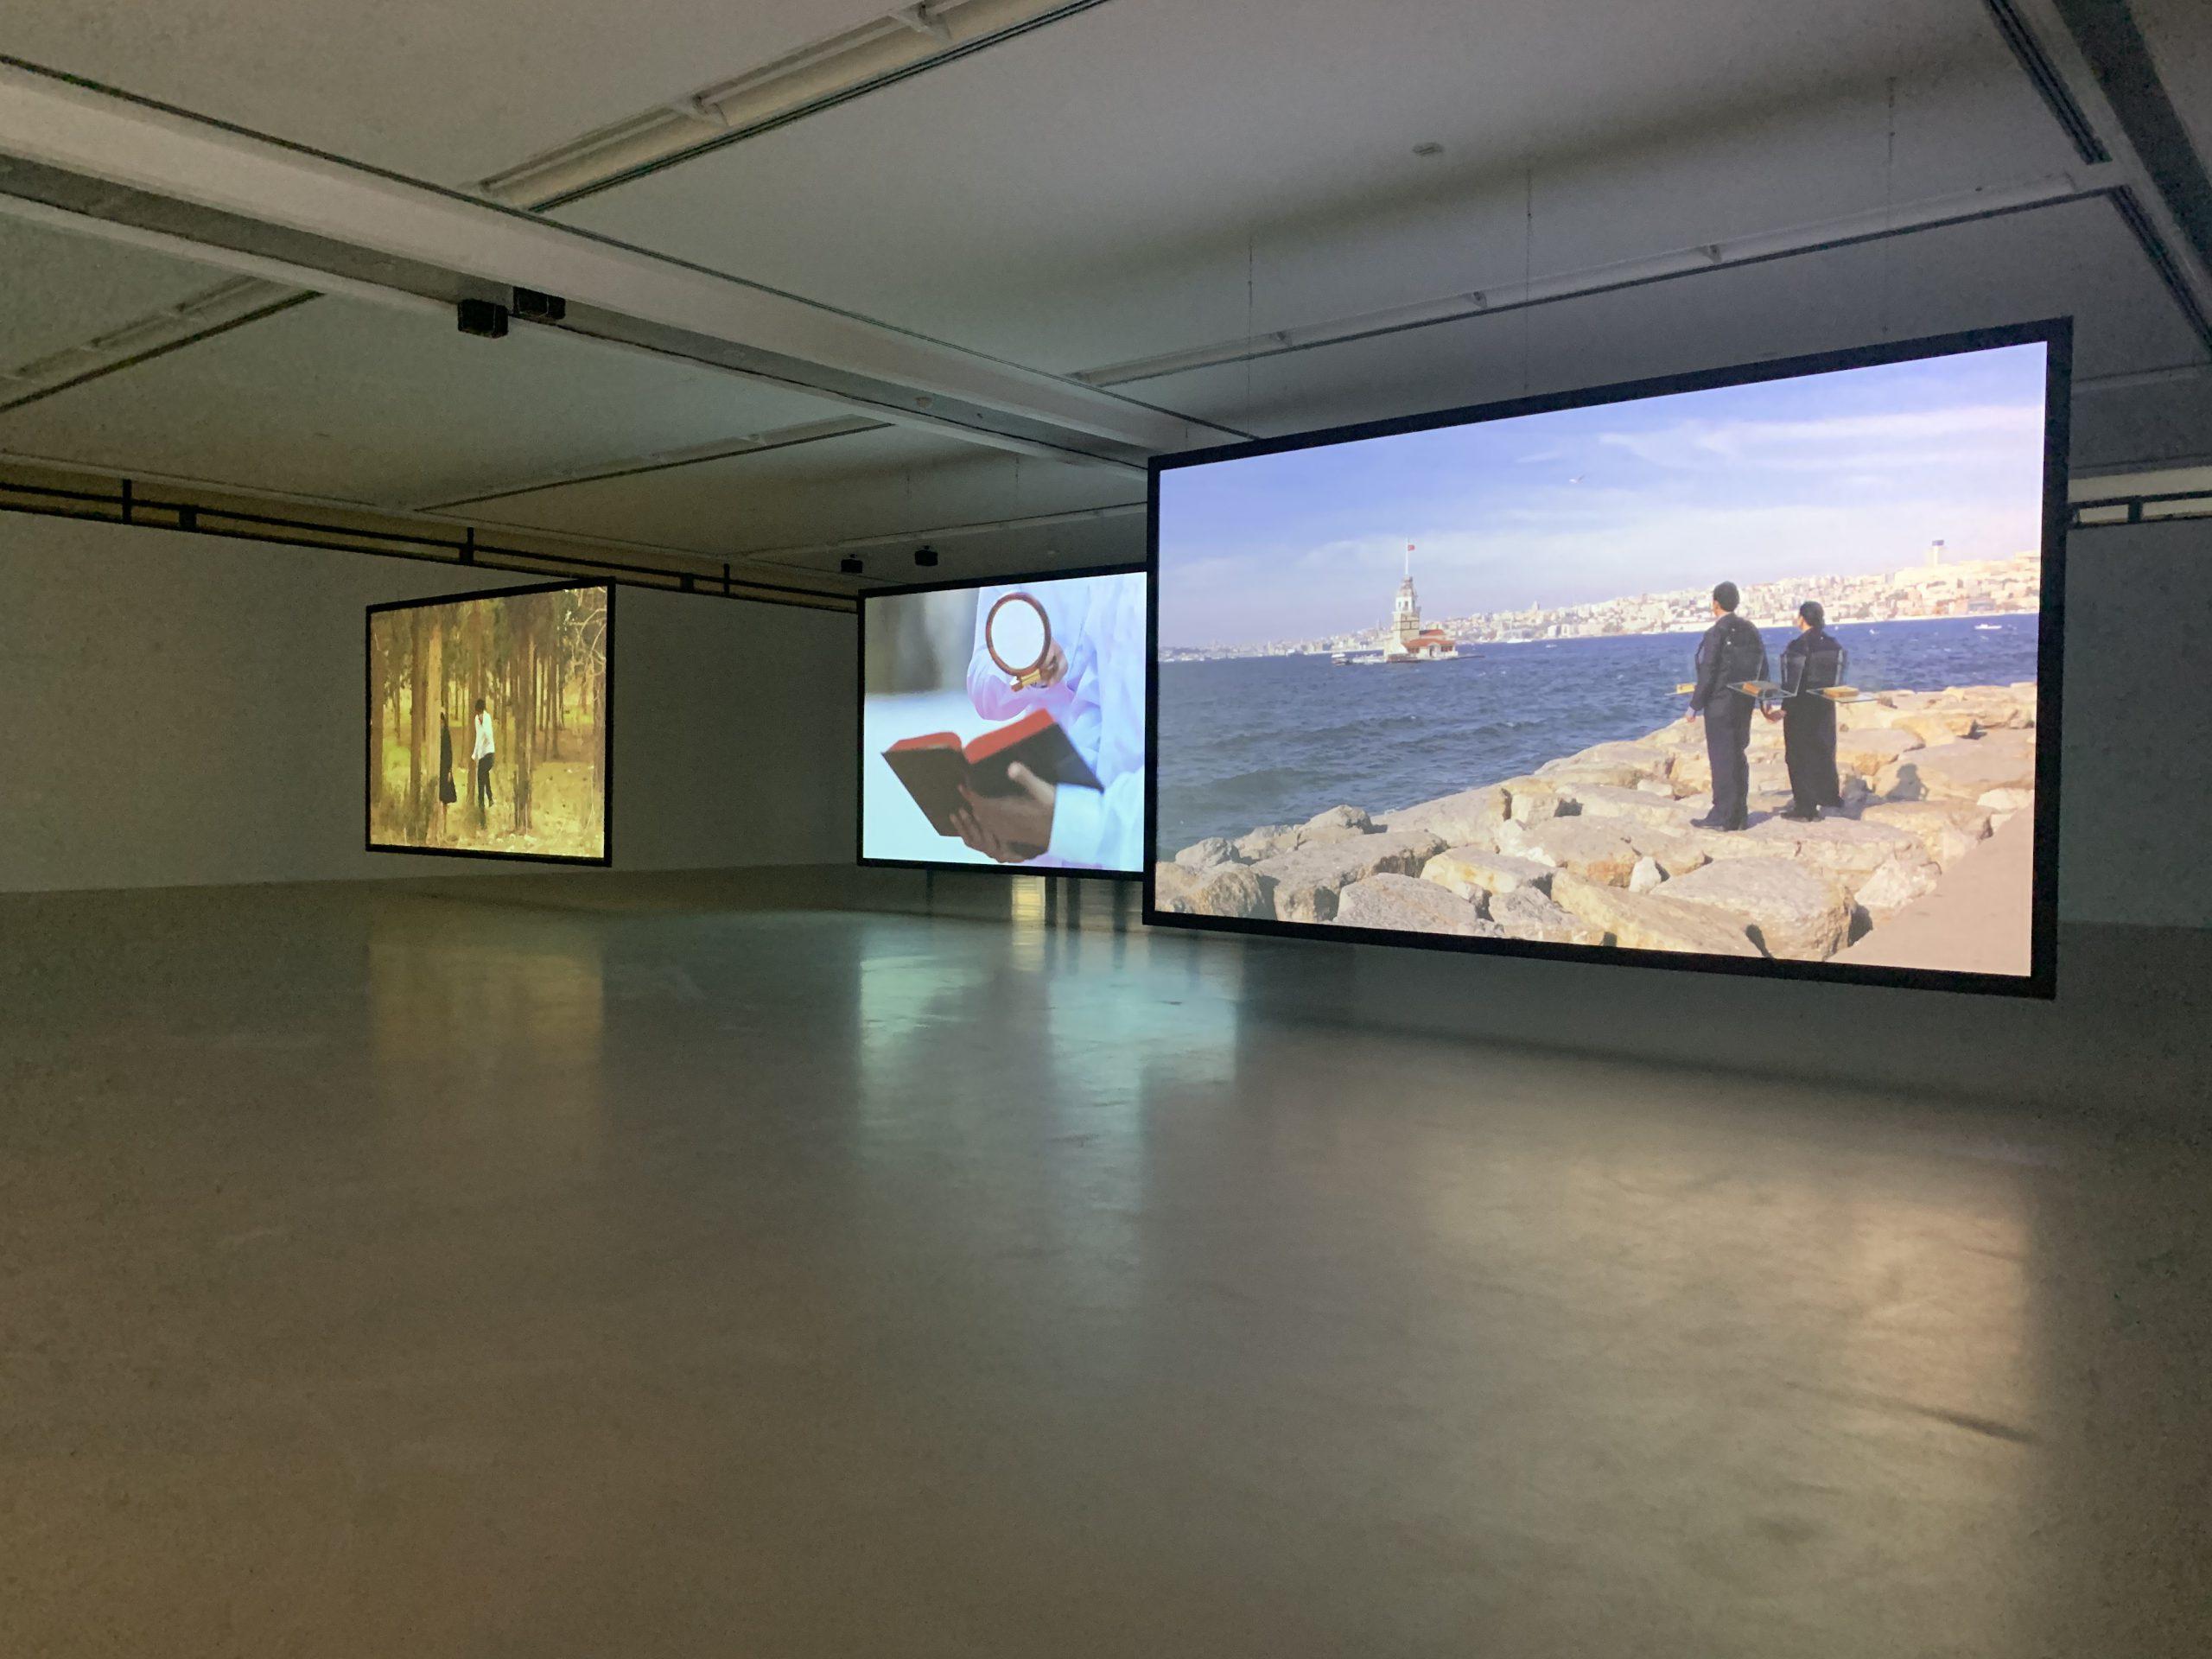 Nezaket Ekici and Shahar Marcus, Installation view, Nezaket Ekici and Shahar Marcus, TBQ, Städtische Galerie Nordhorn, Photos: Thomas Niemeyer, Nele, Nezaket Ekici, Camera: Thomas Niemeyer